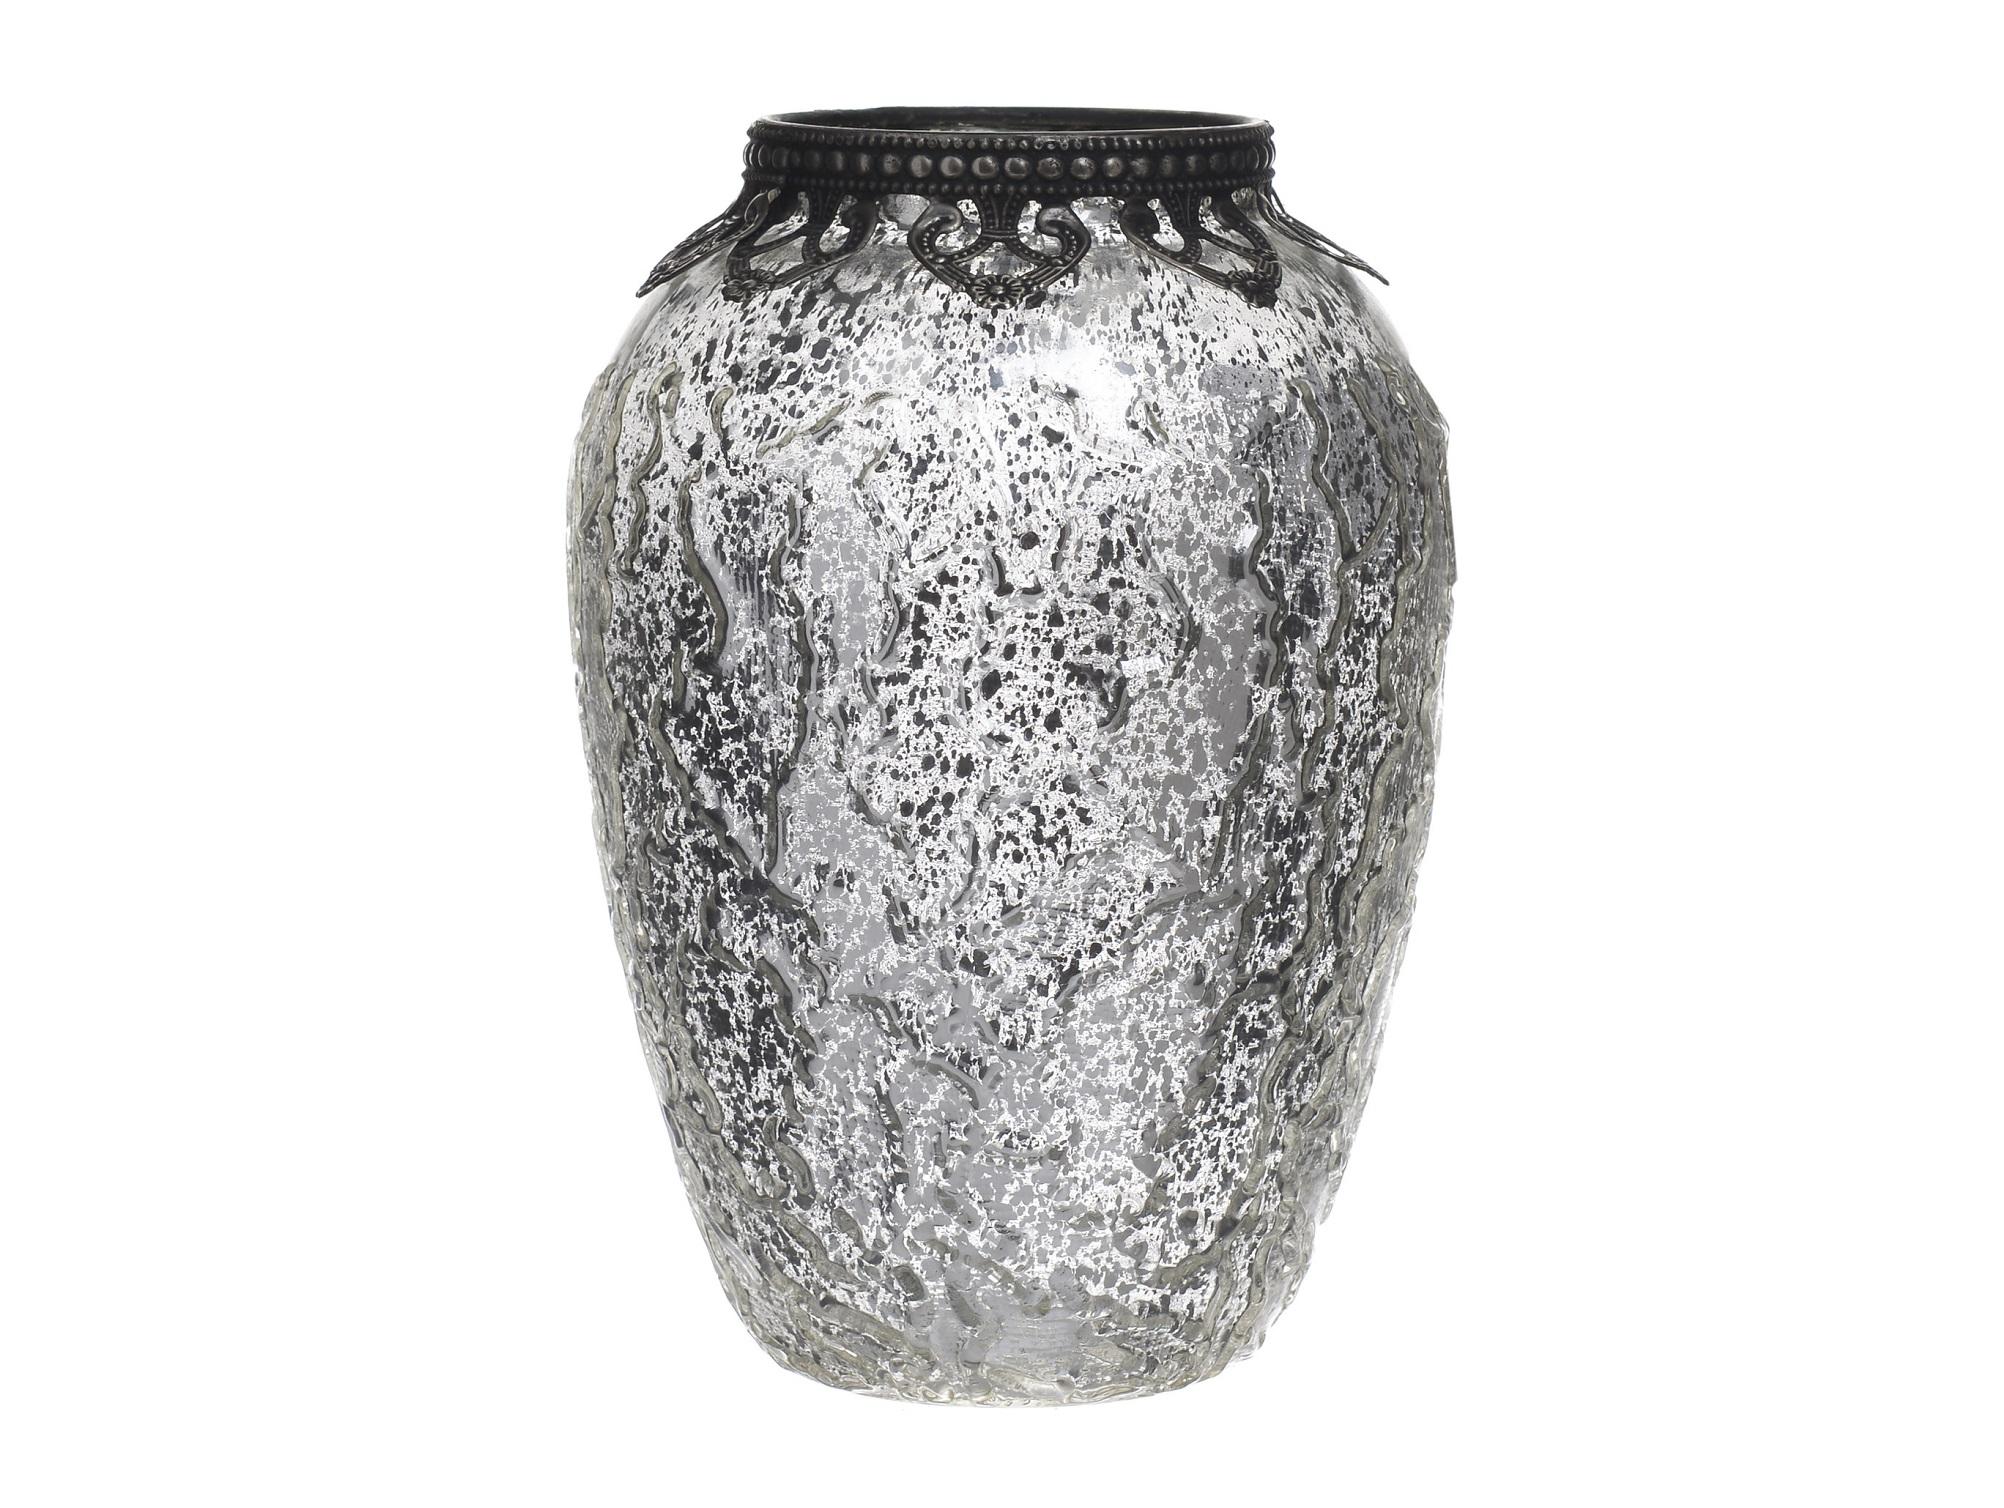 Ваза JaseВазы<br>Материал: стекло, металл<br><br>Material: Стекло<br>Высота см: 17.5